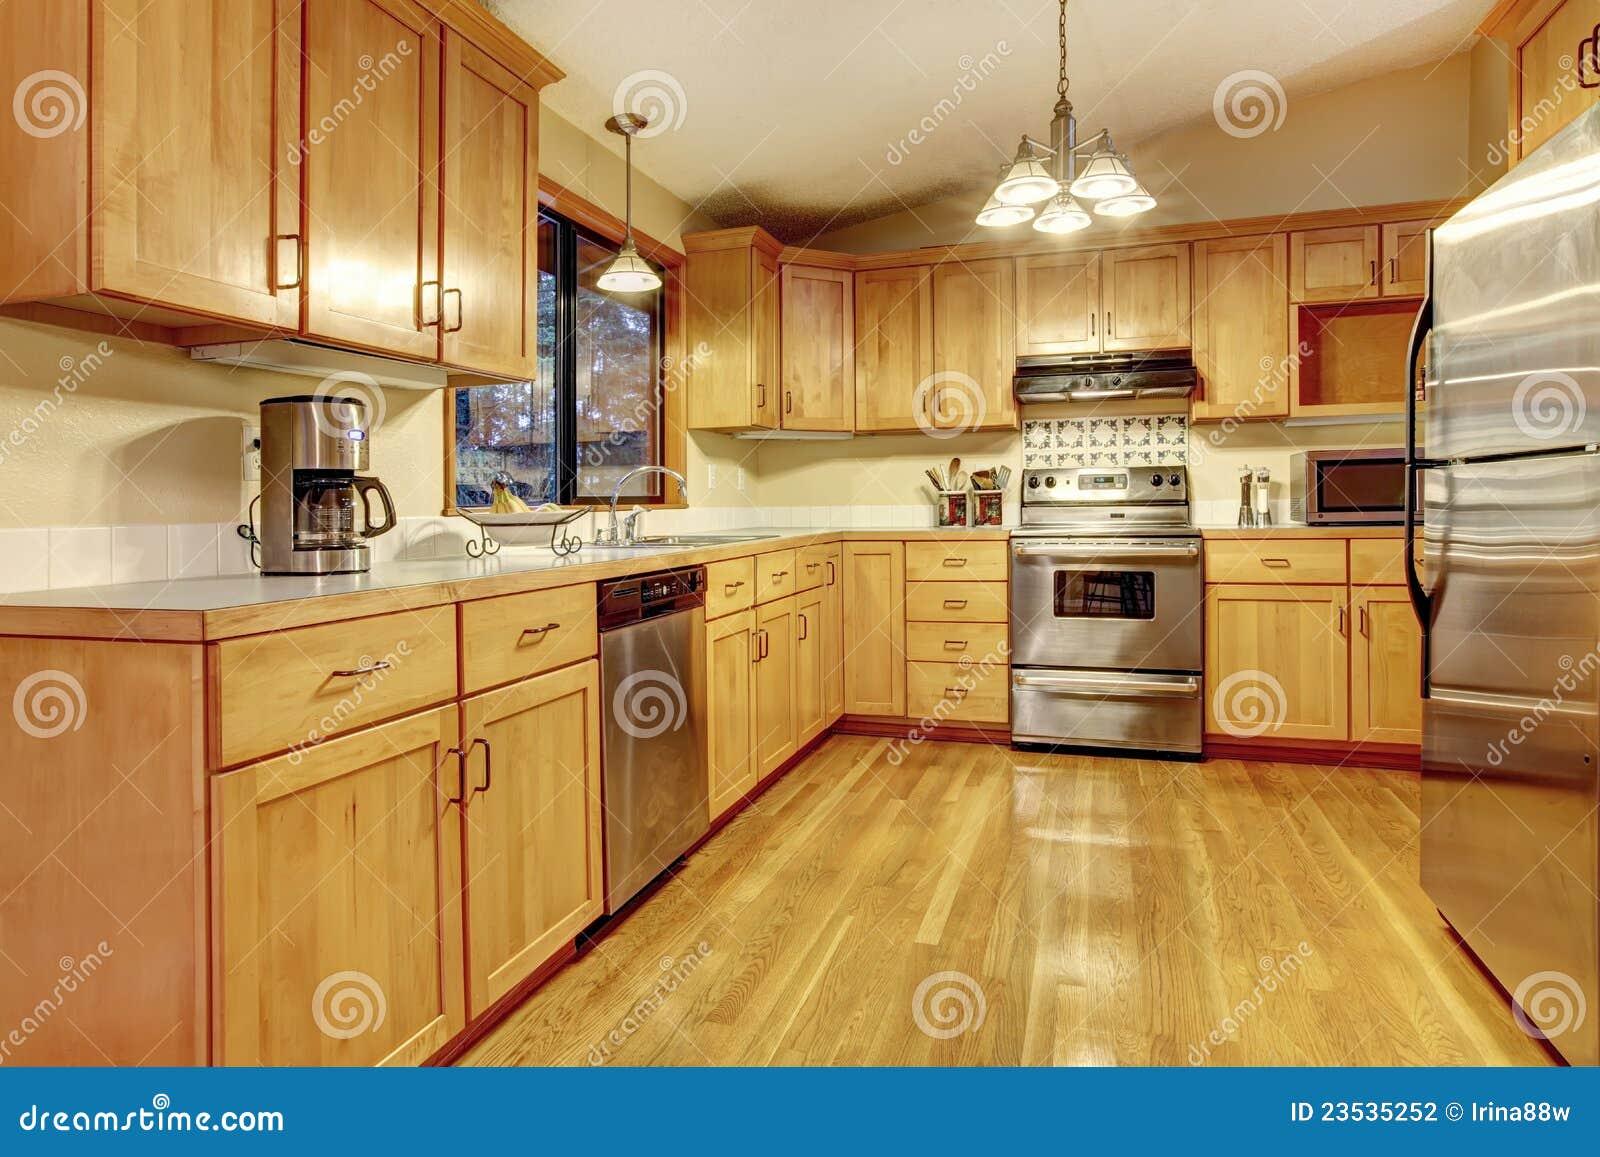 Gele warme houten keuken met nieuwe vloer stock fotografie afbeelding 23535252 - Moderne amerikaanse keuken ...